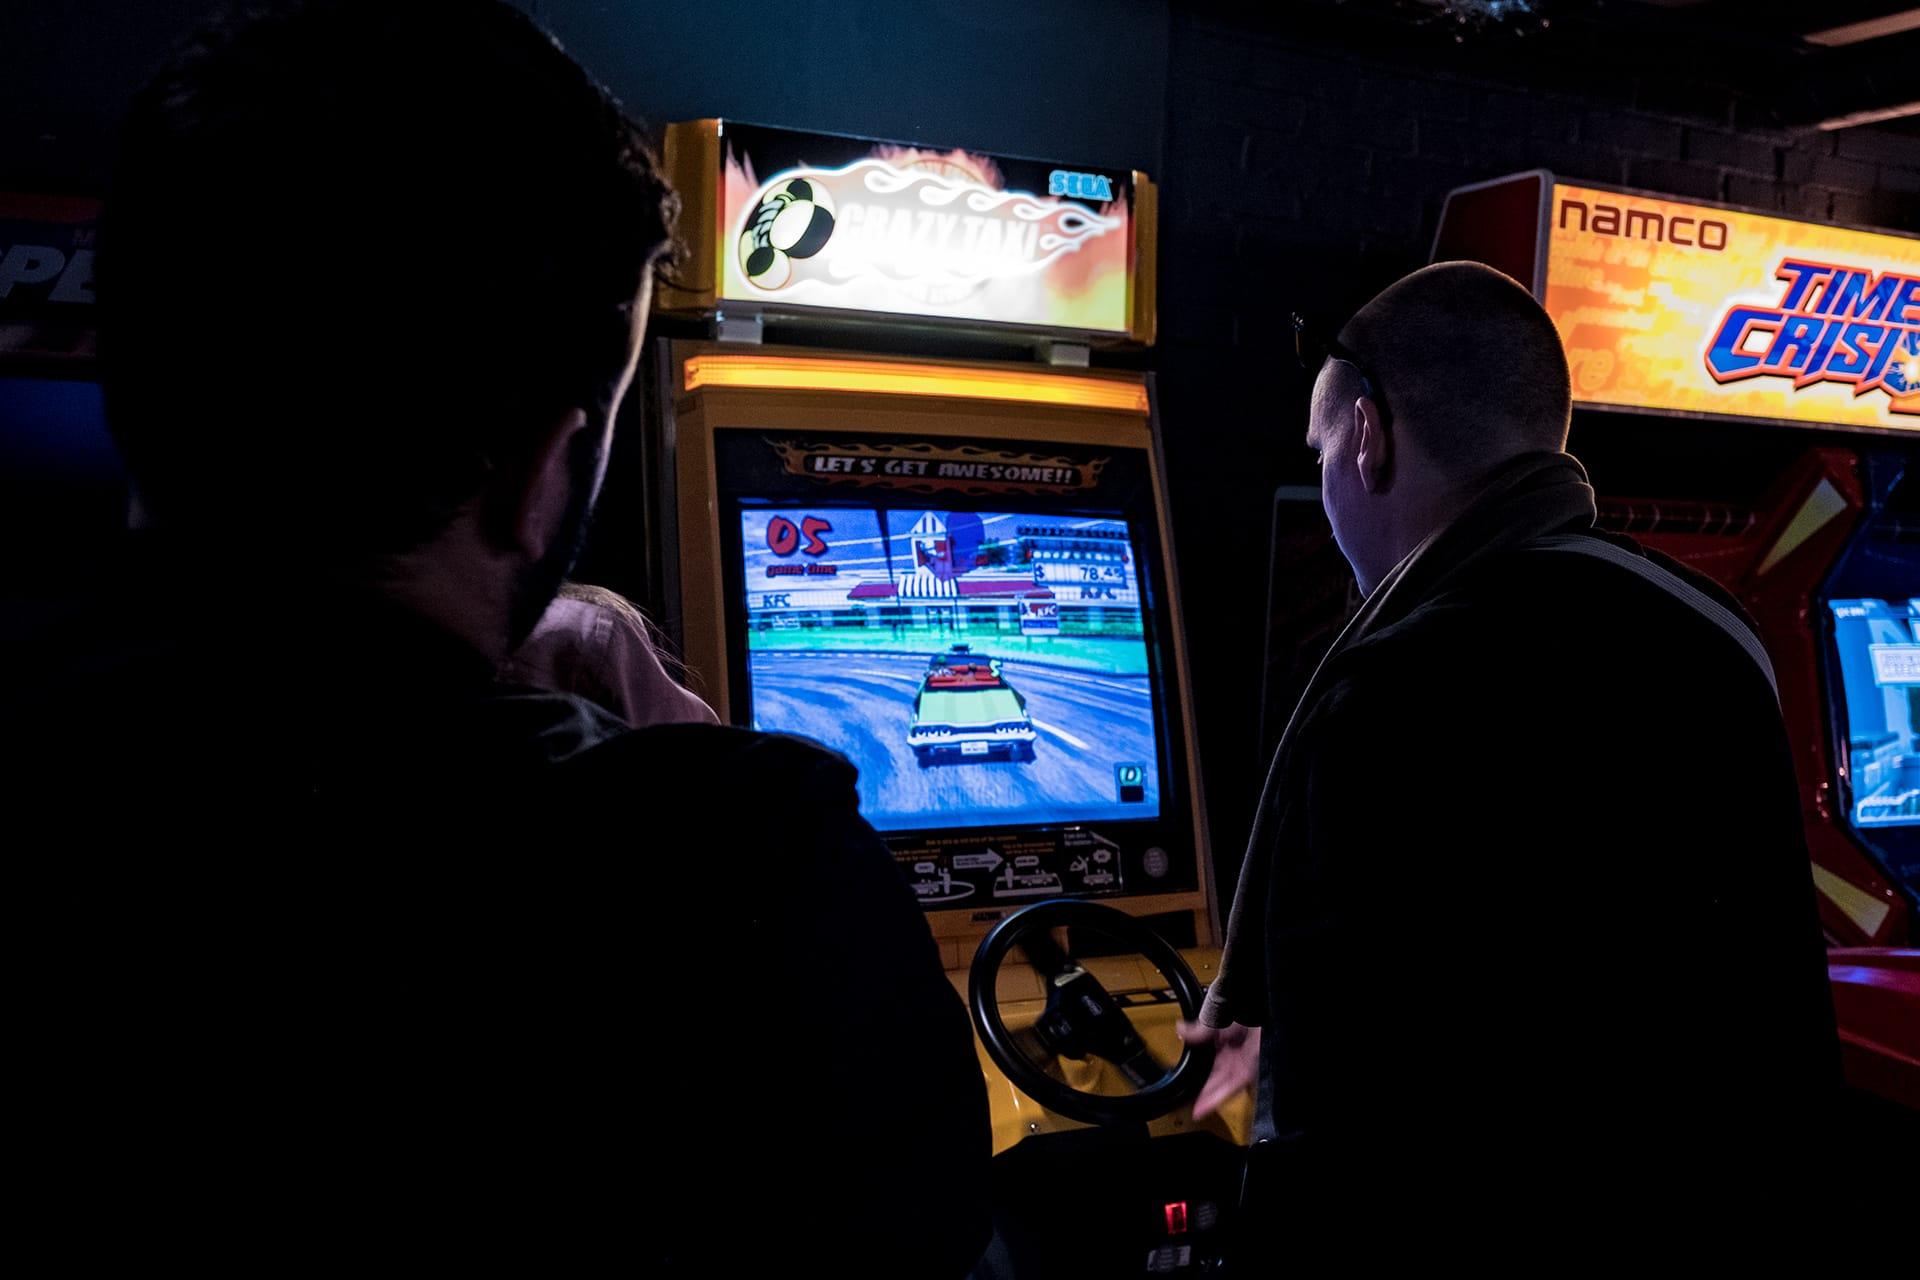 Zamenhof_Game_Room_Arcade_mnecander